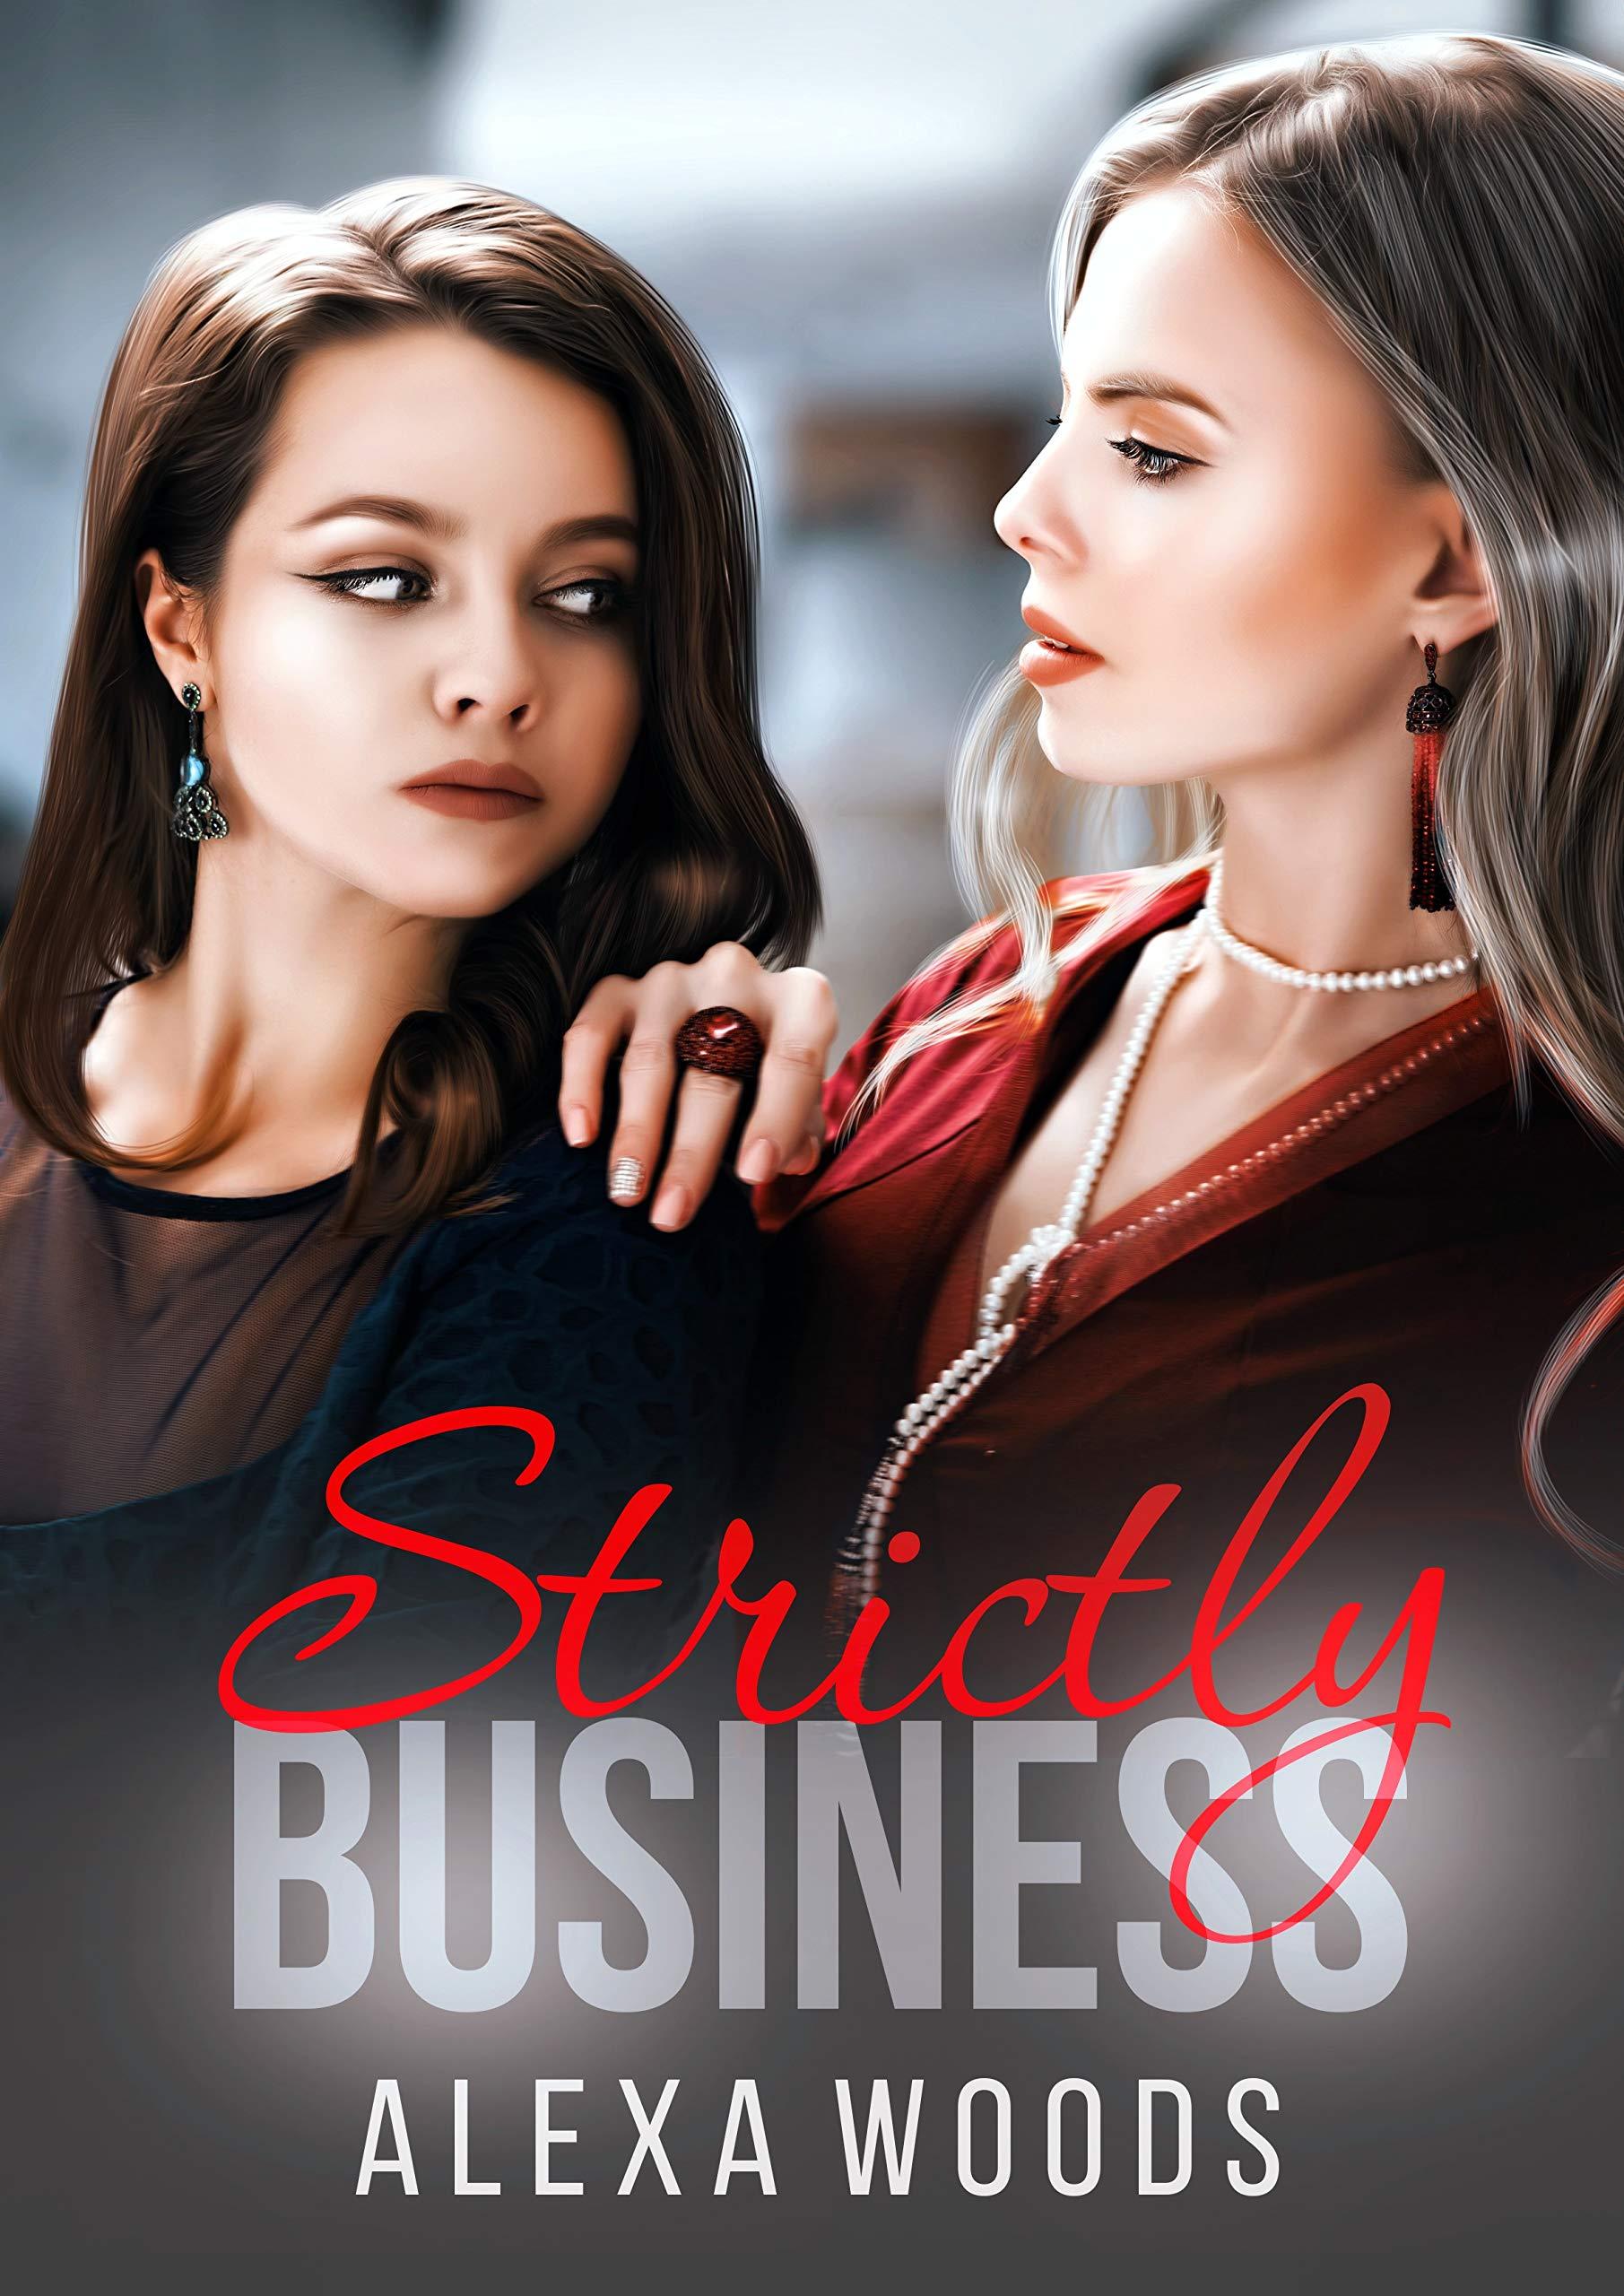 Strictly Business : A Lesbian Romance